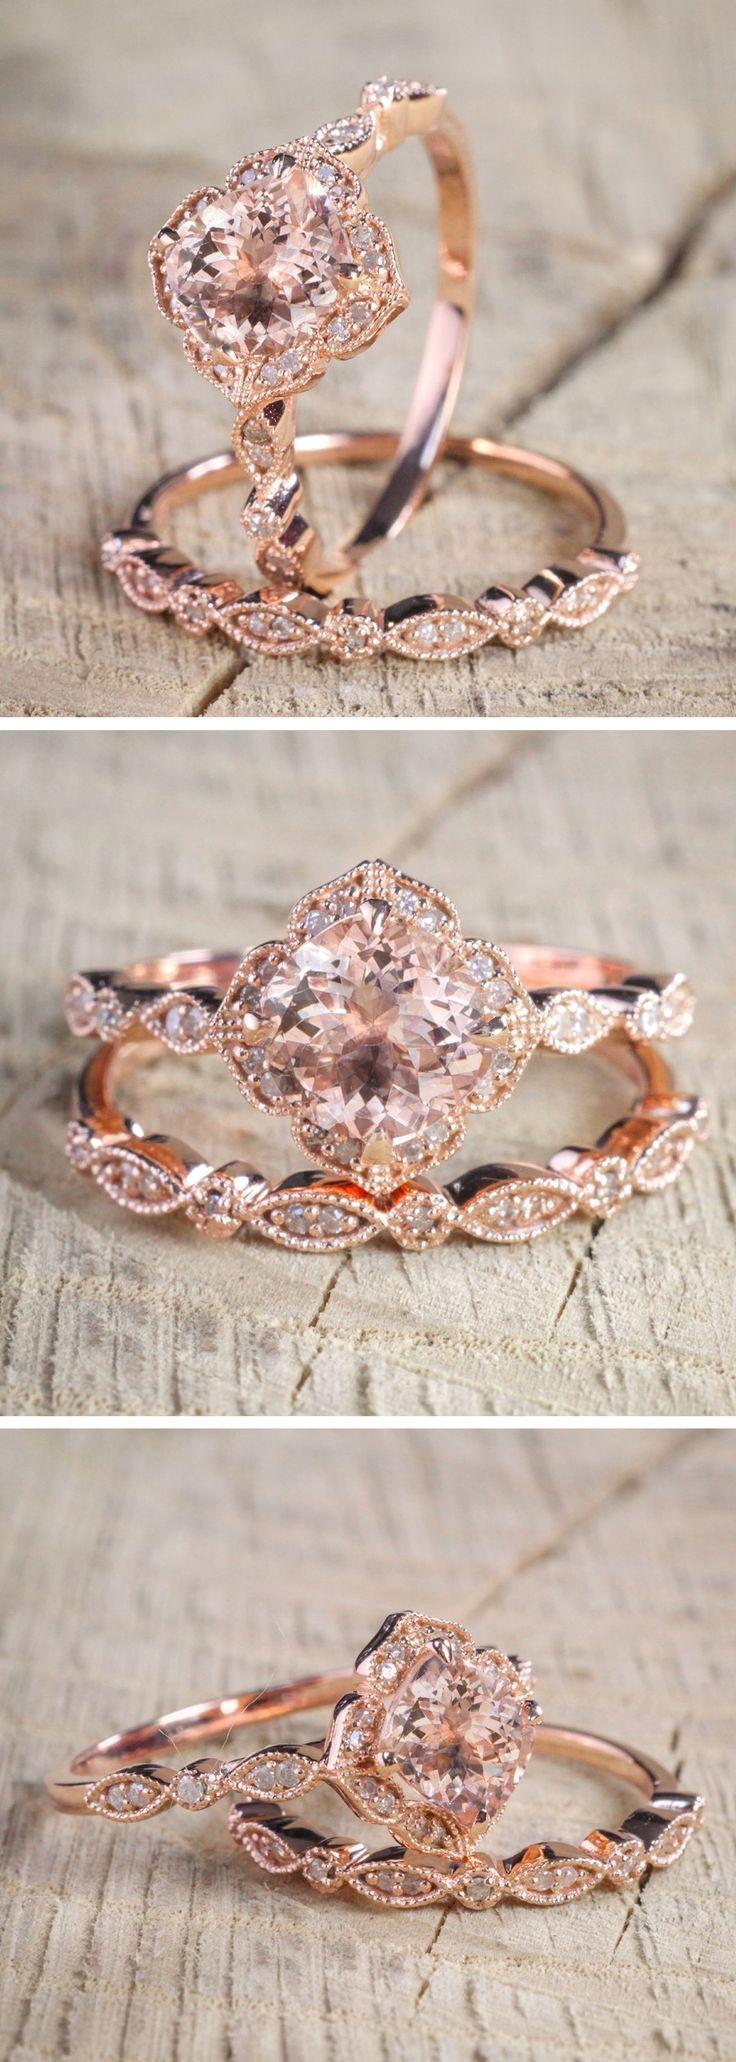 Morganite Diamond Halo Engagement Ring || Modern Vintage Engagement Ring || Budget Friendly Engagement Ring #diamondengagementrings #engagementrings